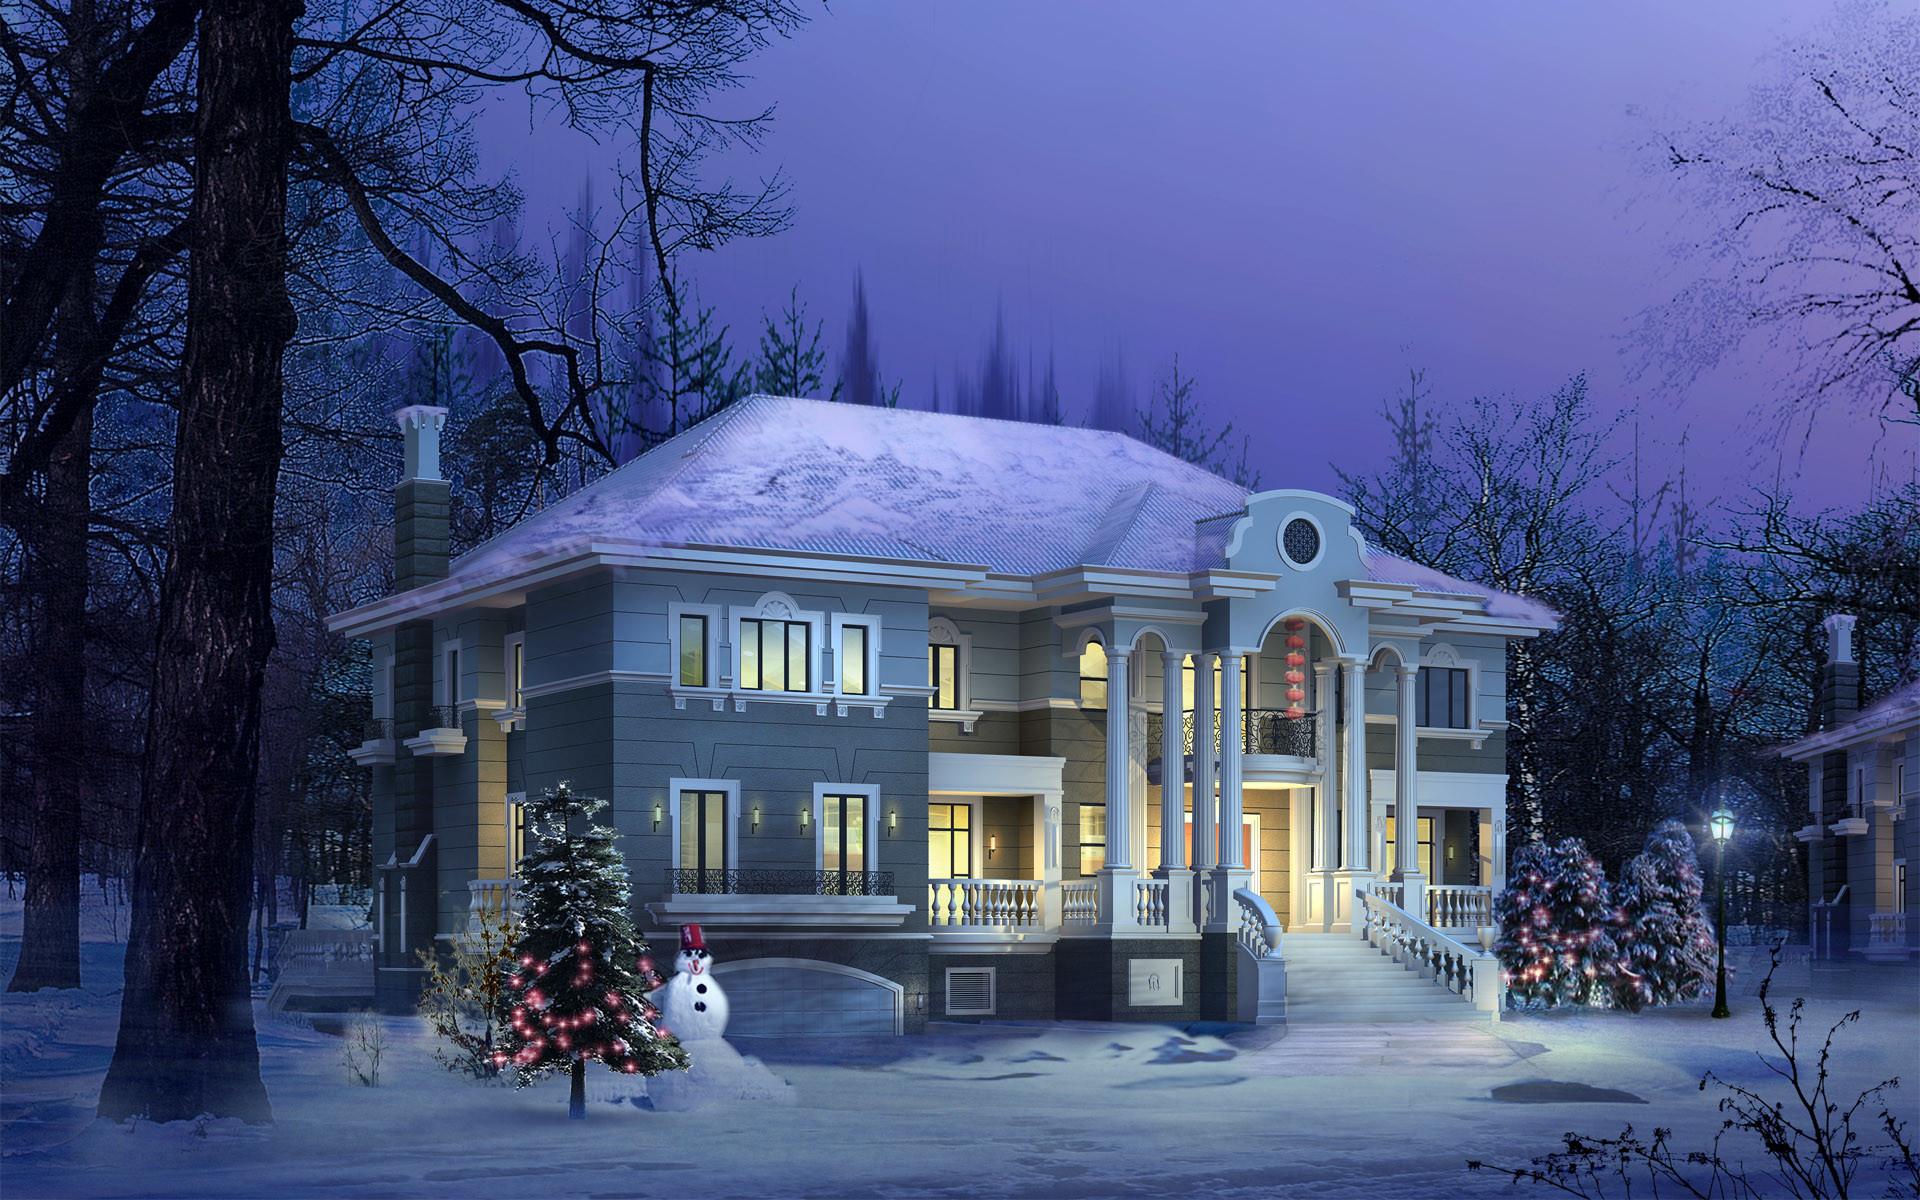 Winter Wallpapers: 35 Beautiful Winter Wallpapers